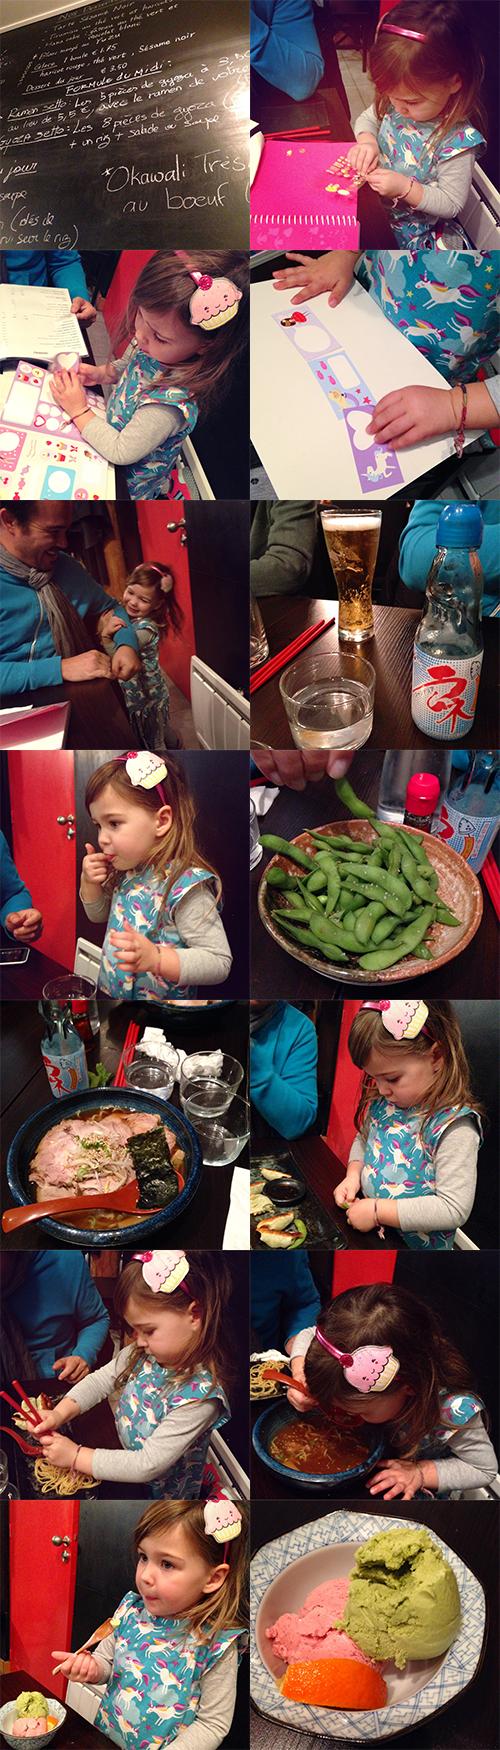 Okawali-Majolo-Usborne-Stickers-Restaurant-avec-Enfant